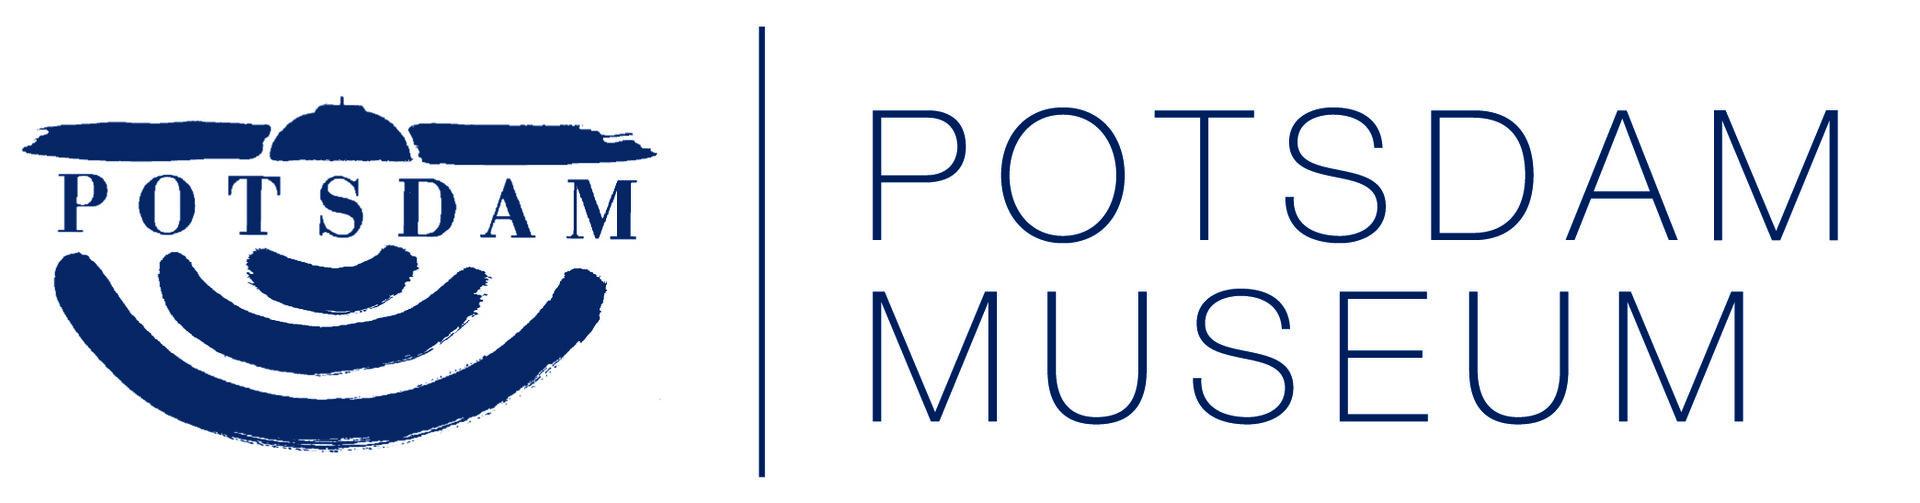 Potsdam Museum